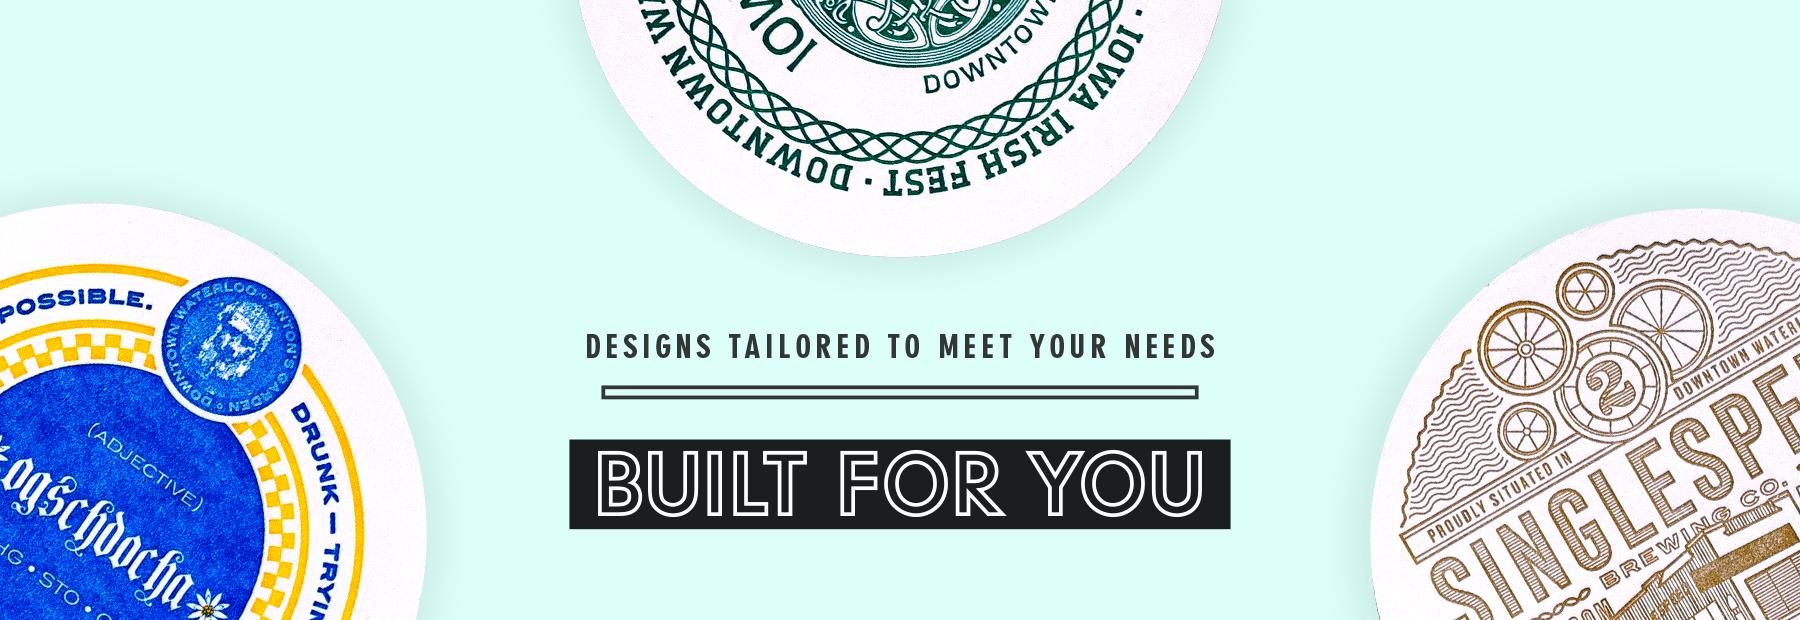 Custom coasters built for you.